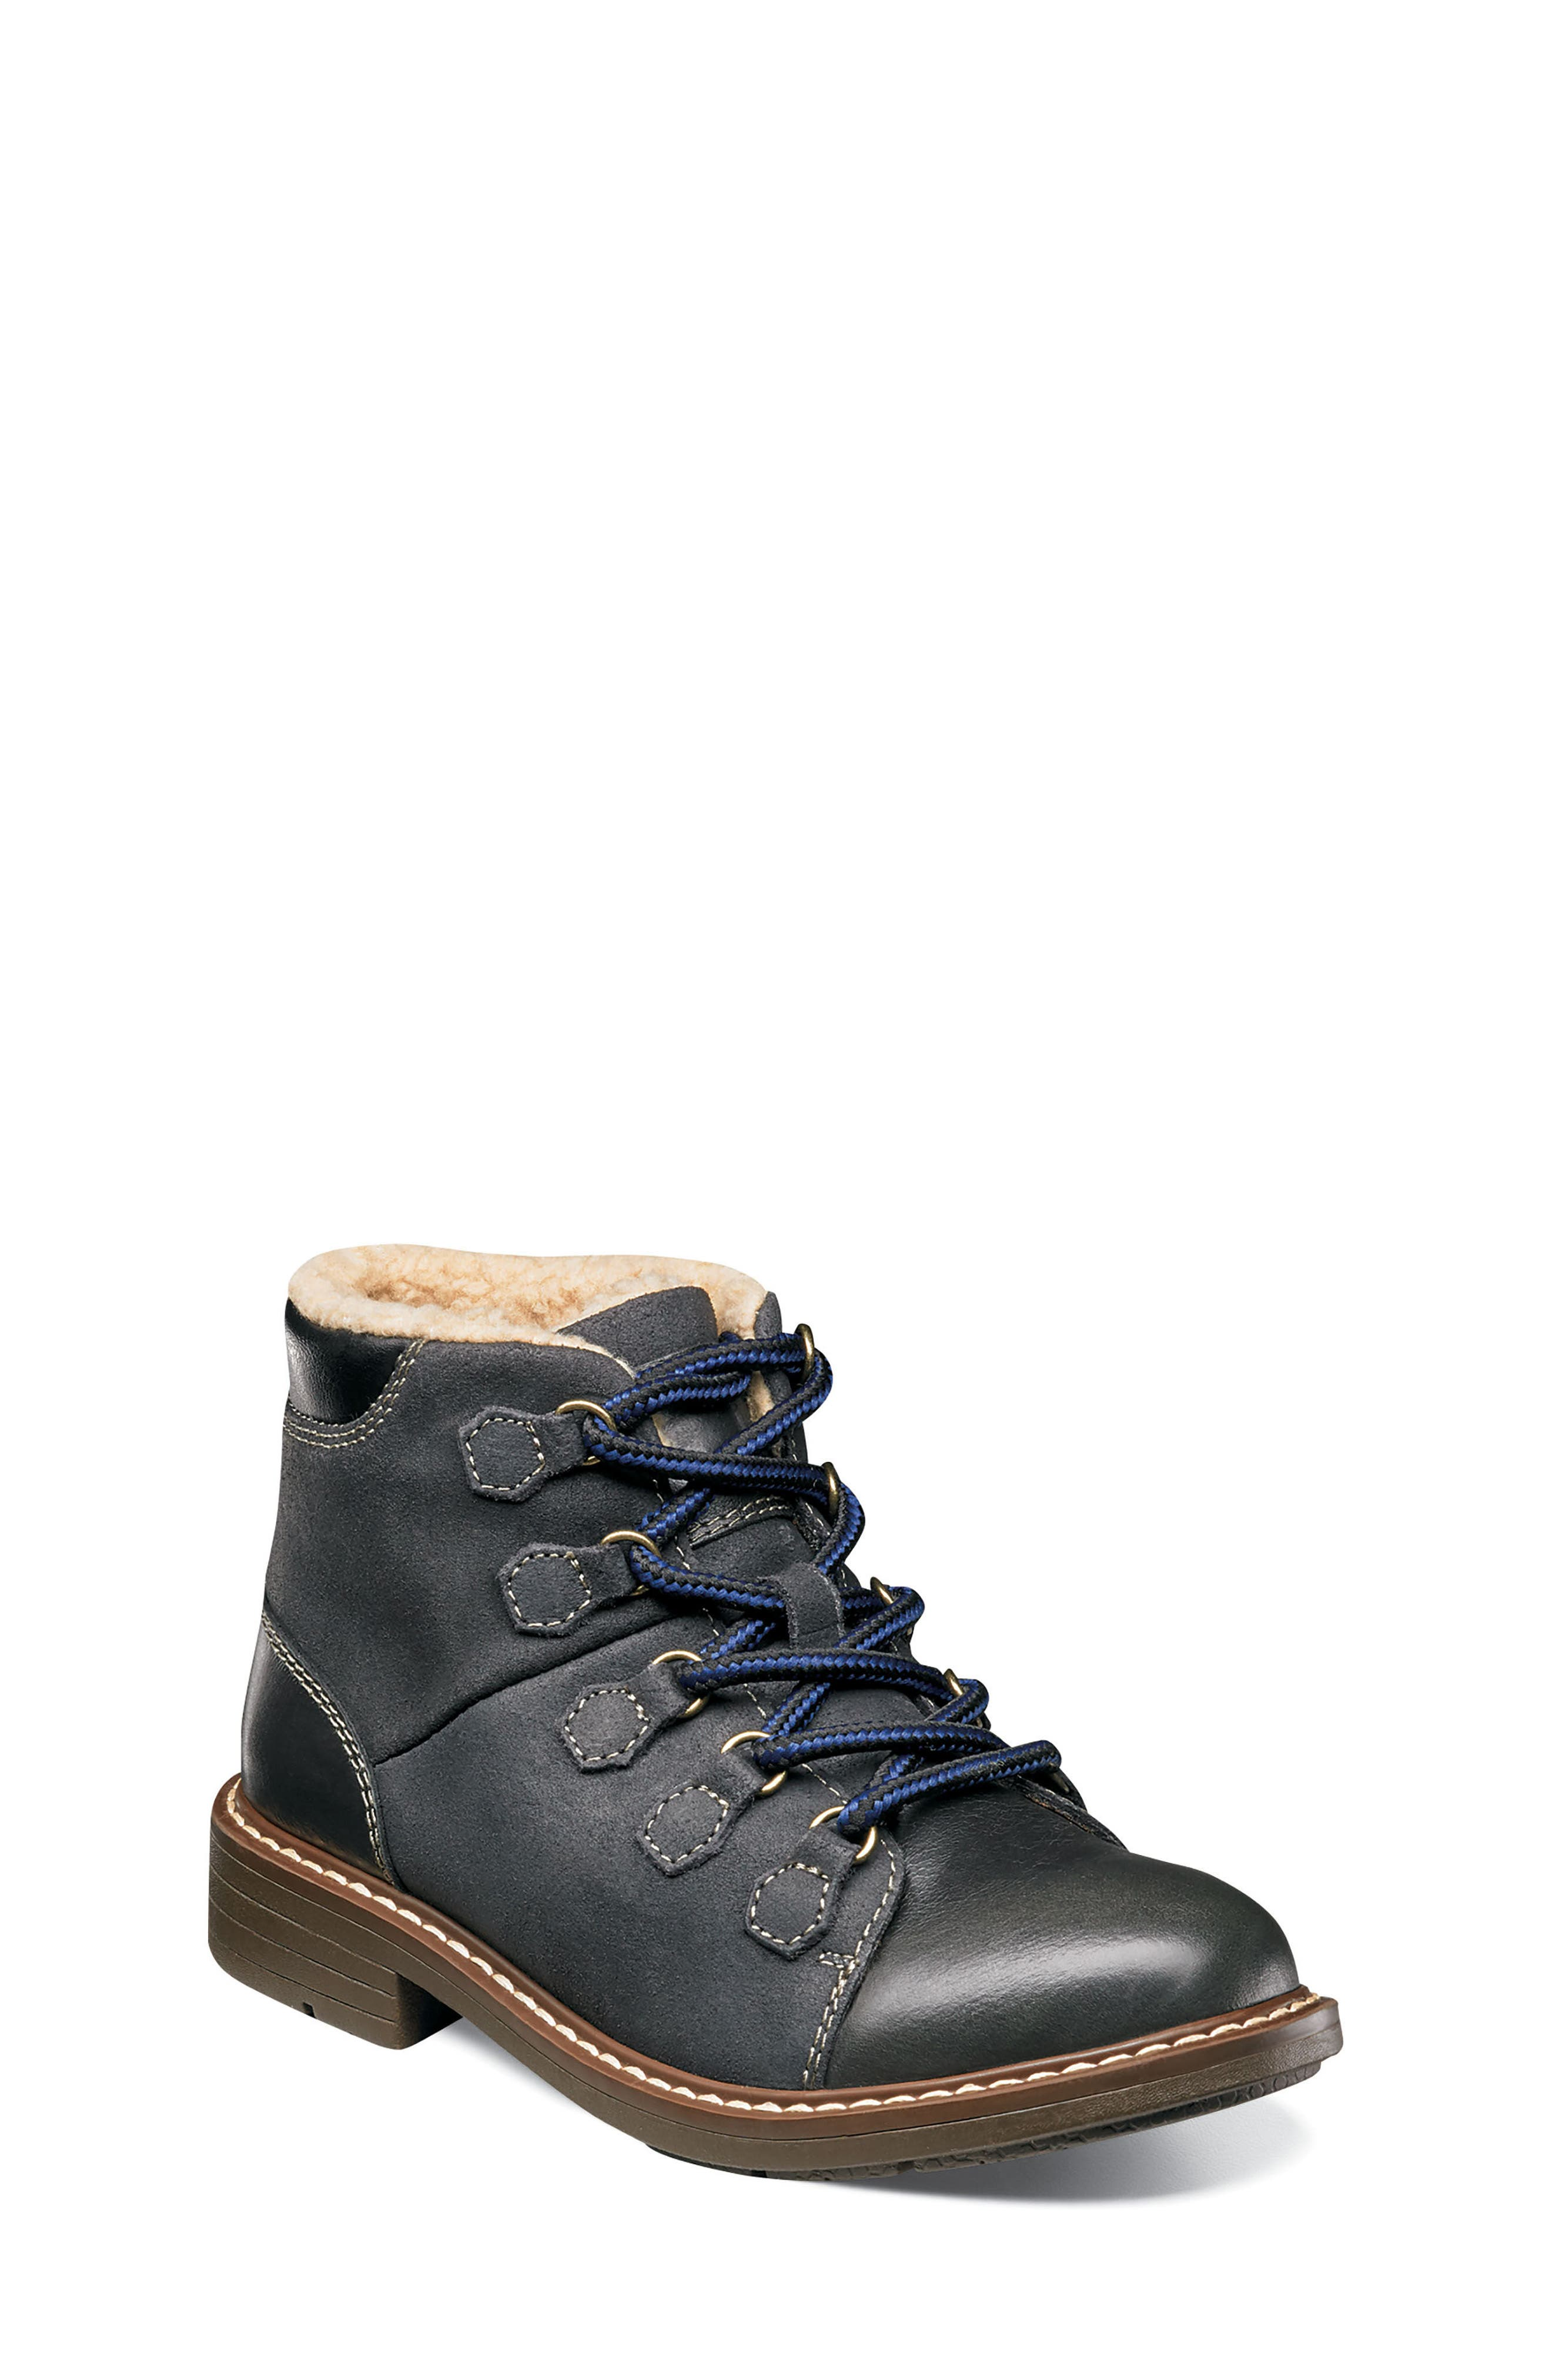 Studio Alpine Plush Lined Boot,                         Main,                         color,